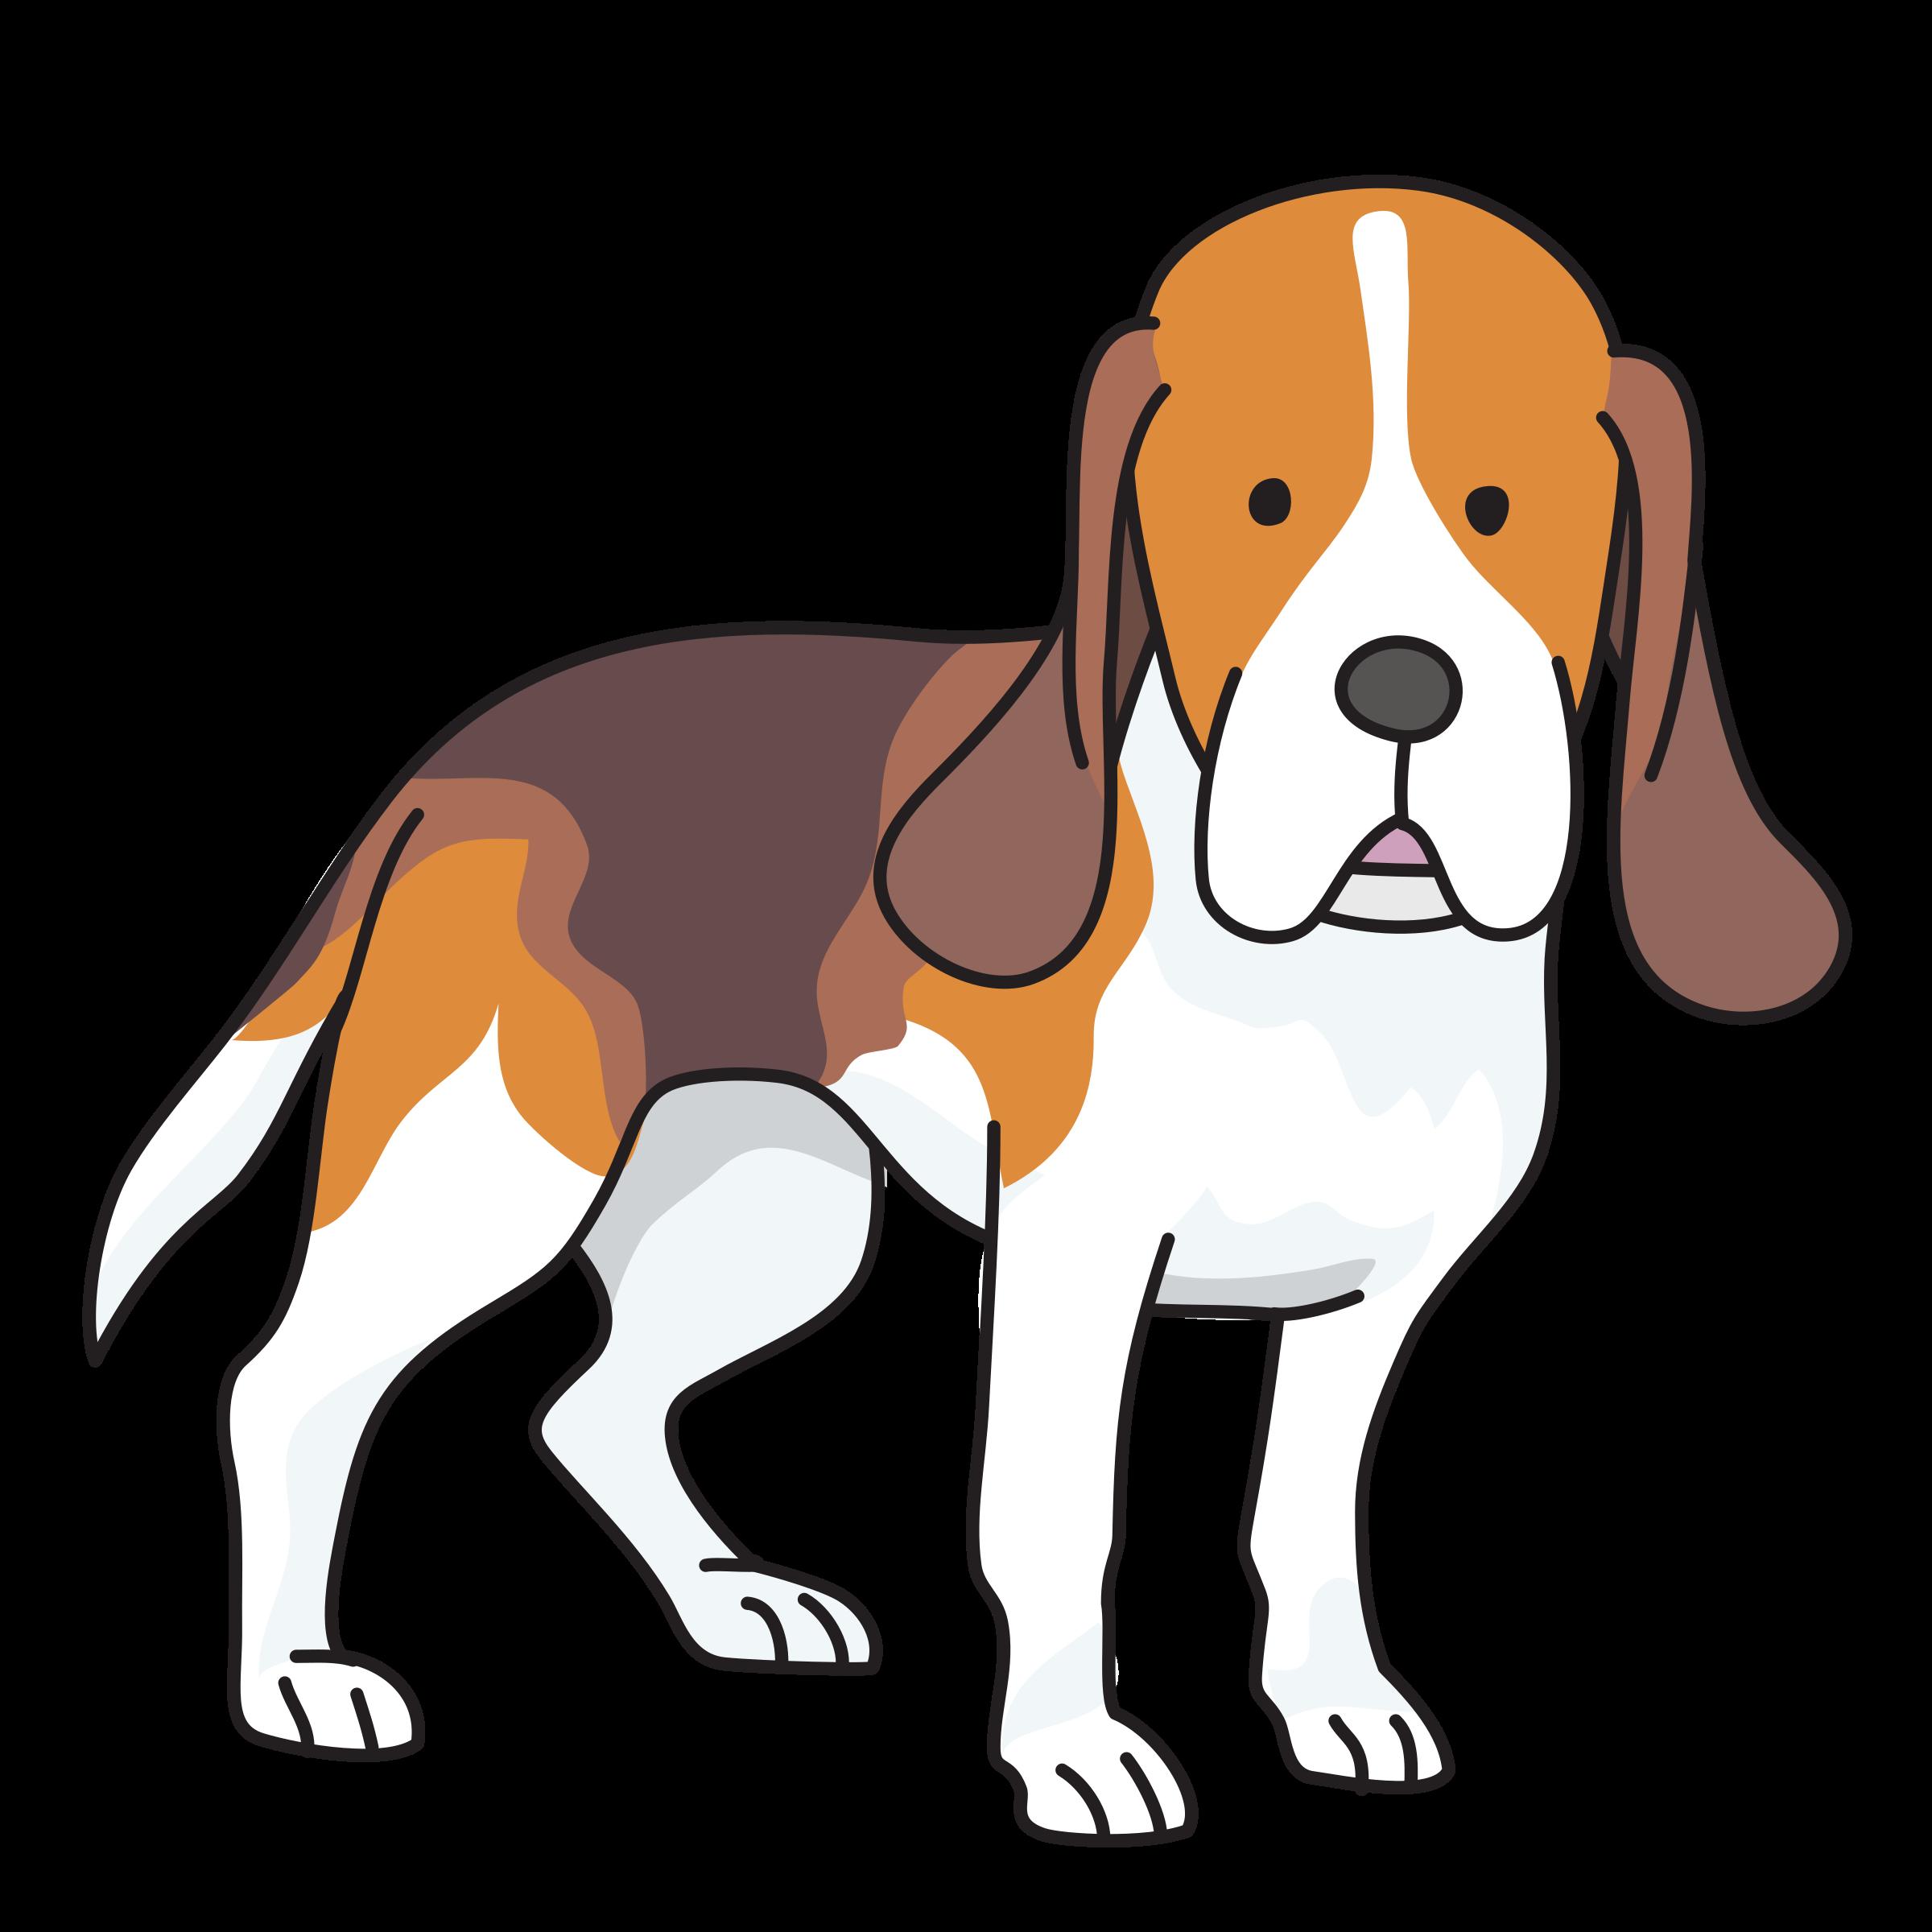 Beagle dog clipart clip free download Clipart - dog - Beagle clip free download